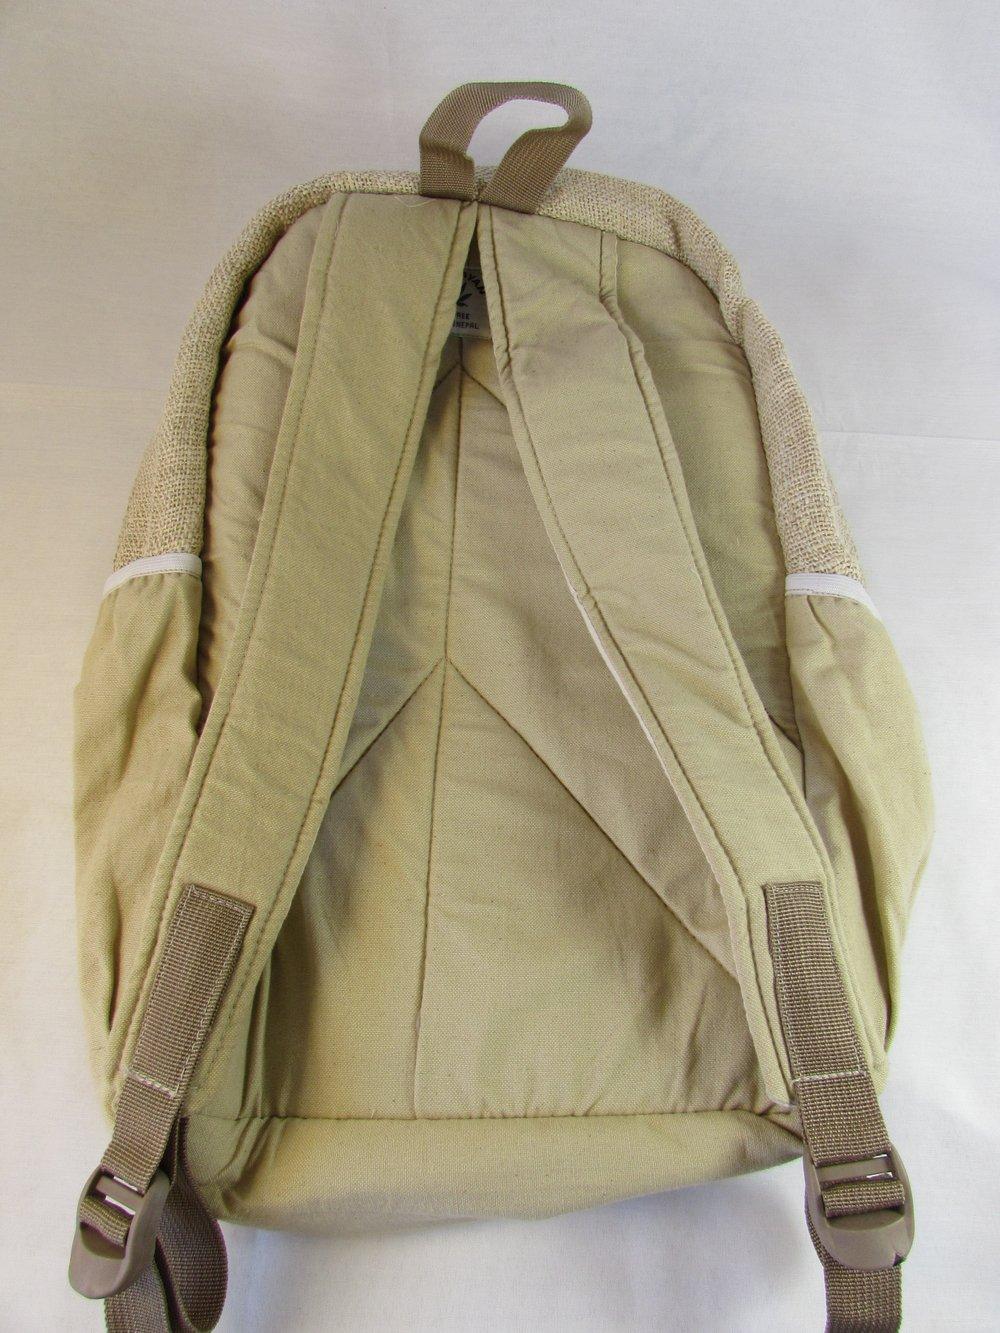 Rainbow - Hemp Backpack   100% Vegan   Eco Friendly   Handmade   Himalayan Hemp